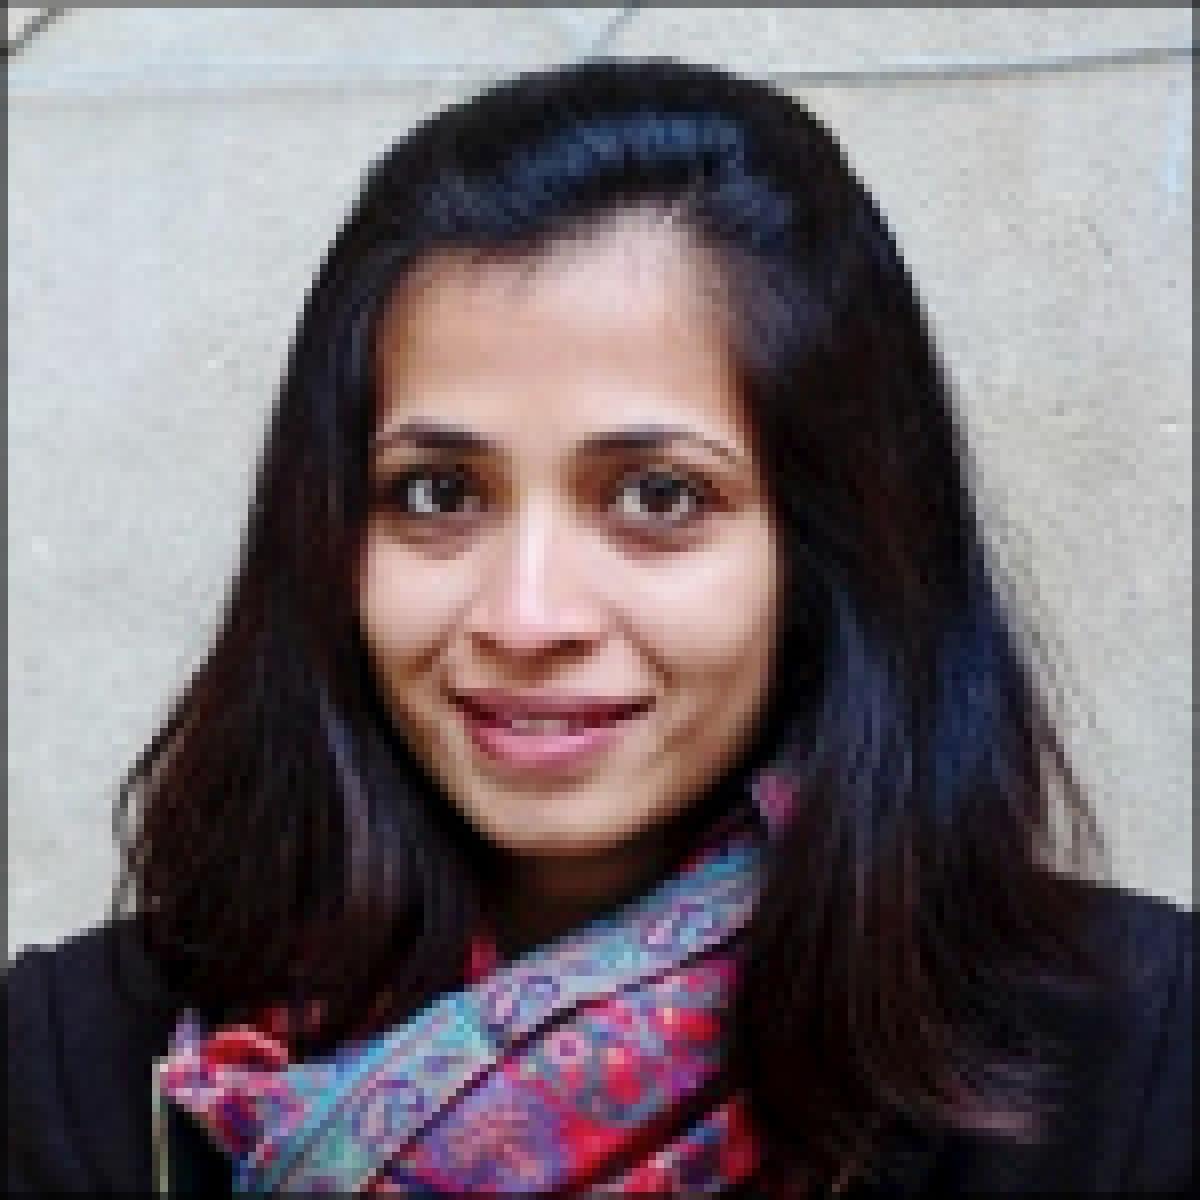 Hotstar appoints Malika Kutub as Vice President - Digital Sales